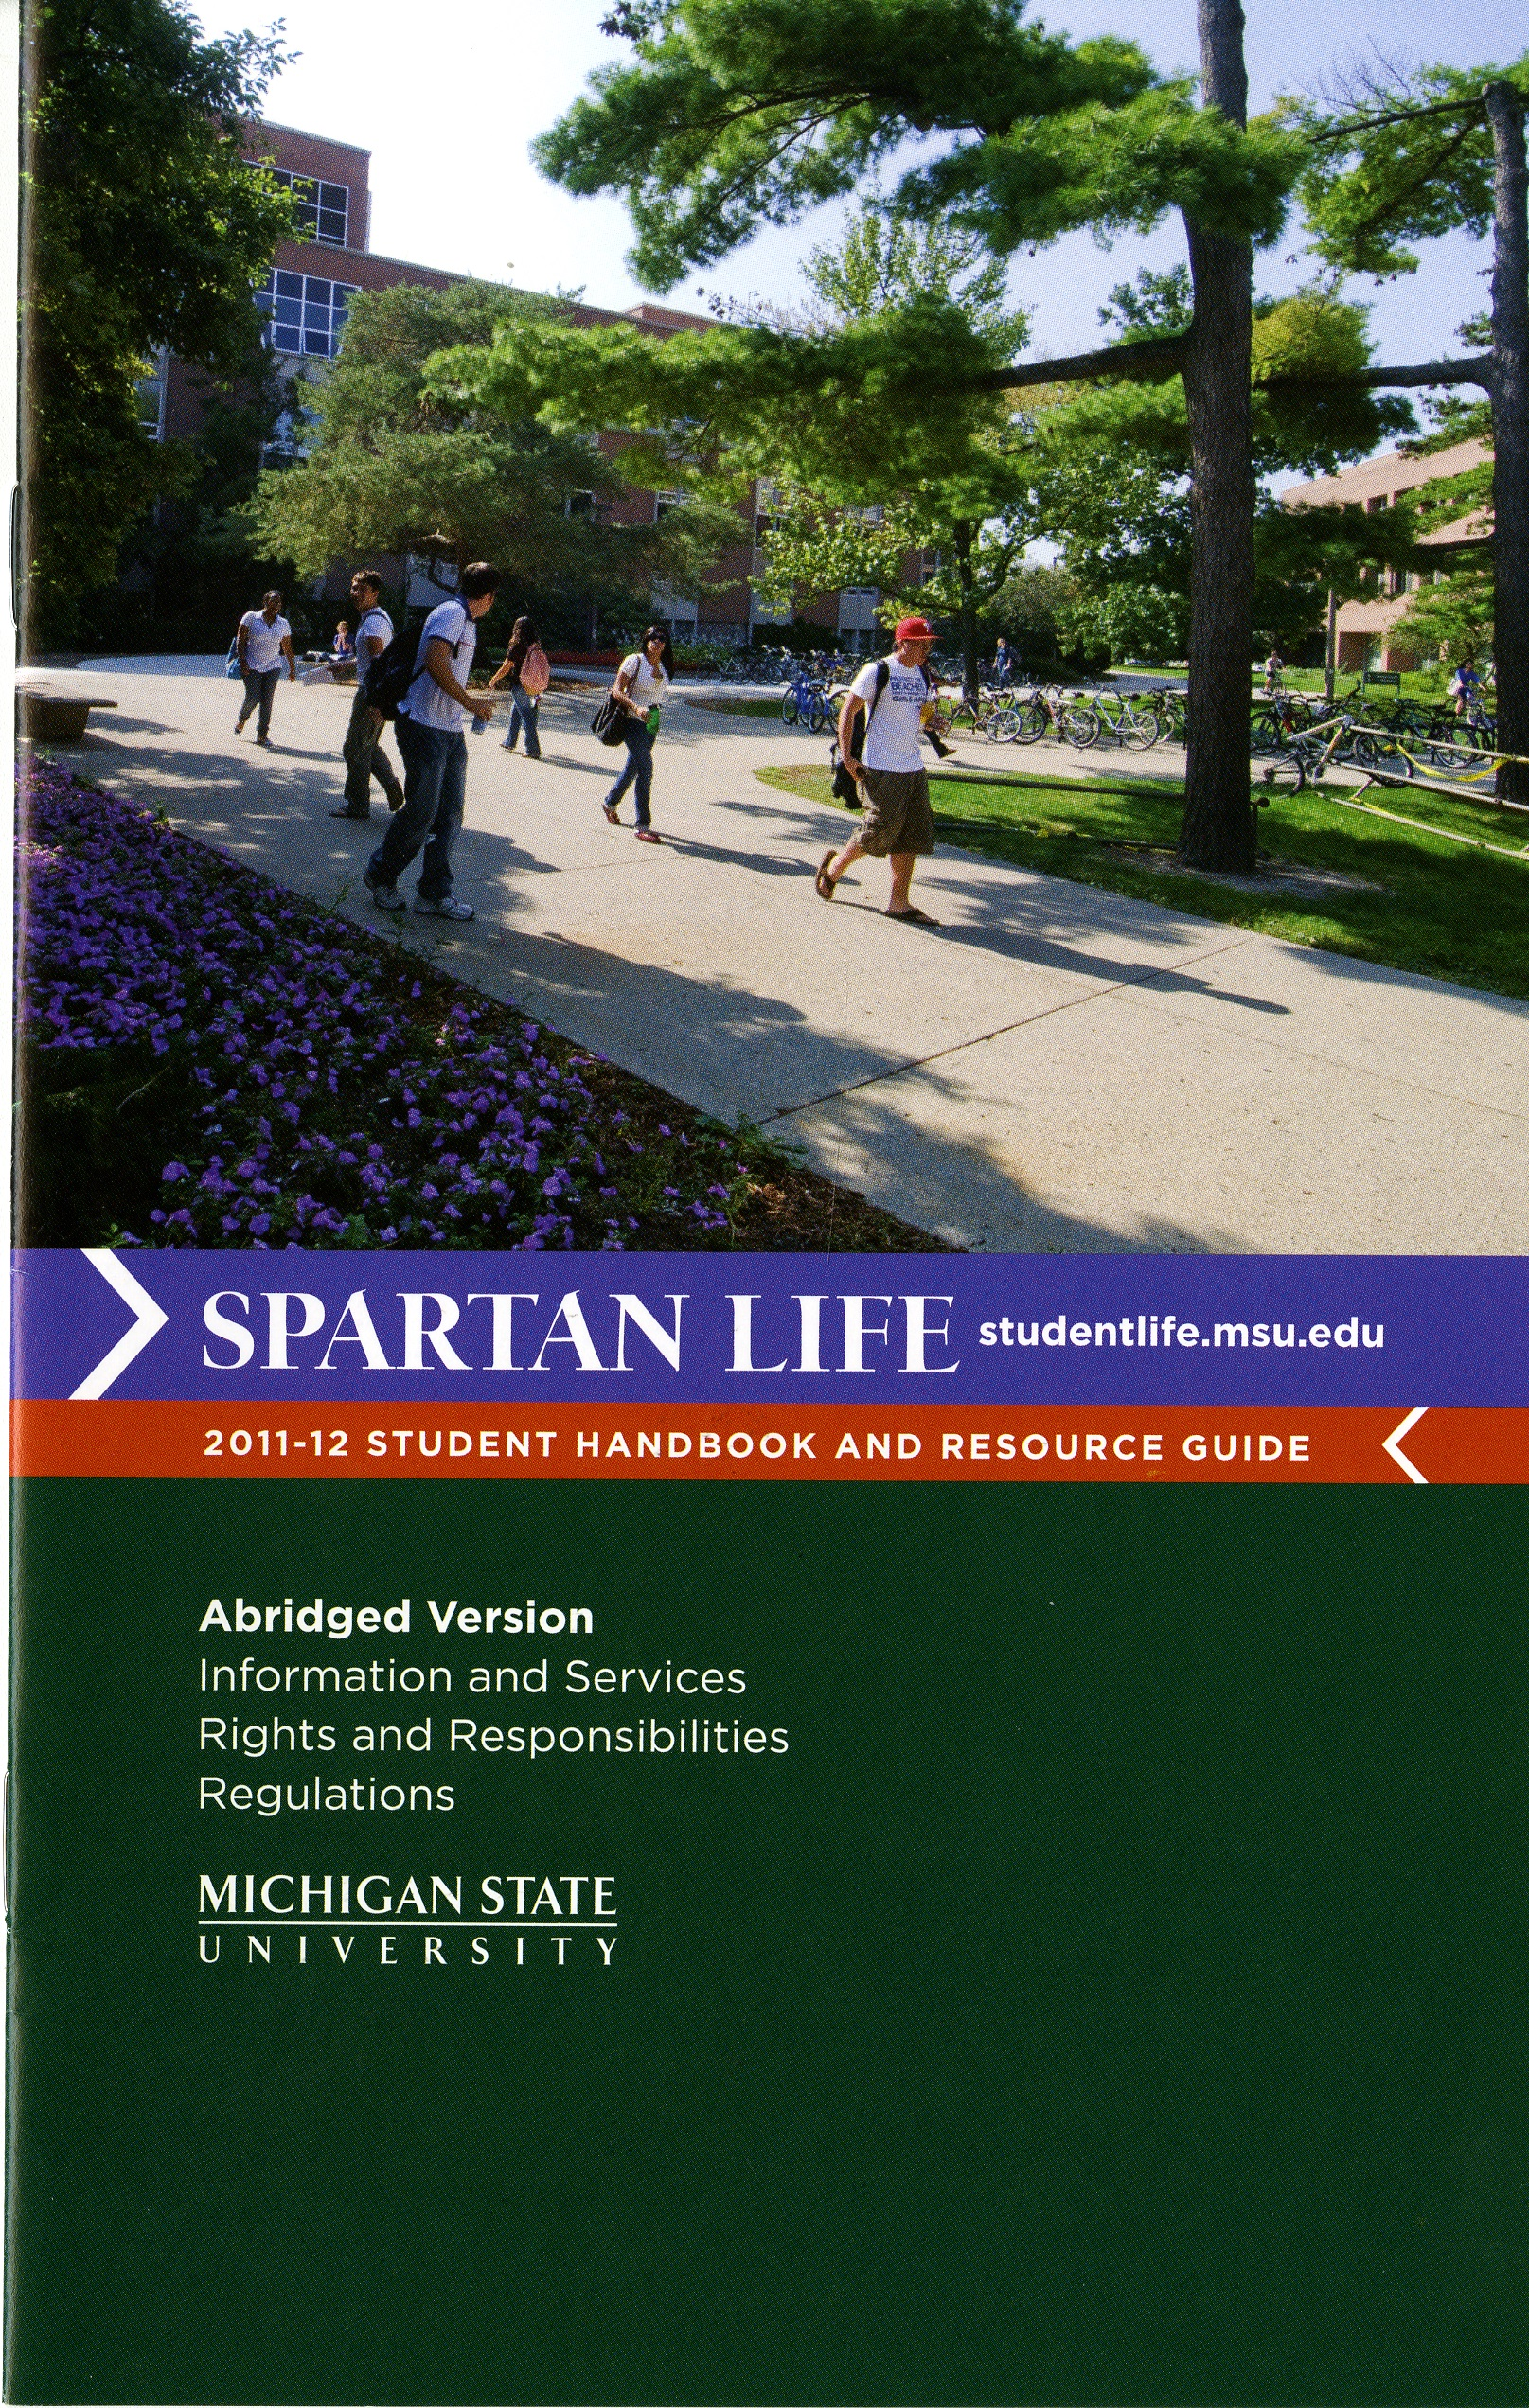 Student Handbook (Abridged), 2011-2012